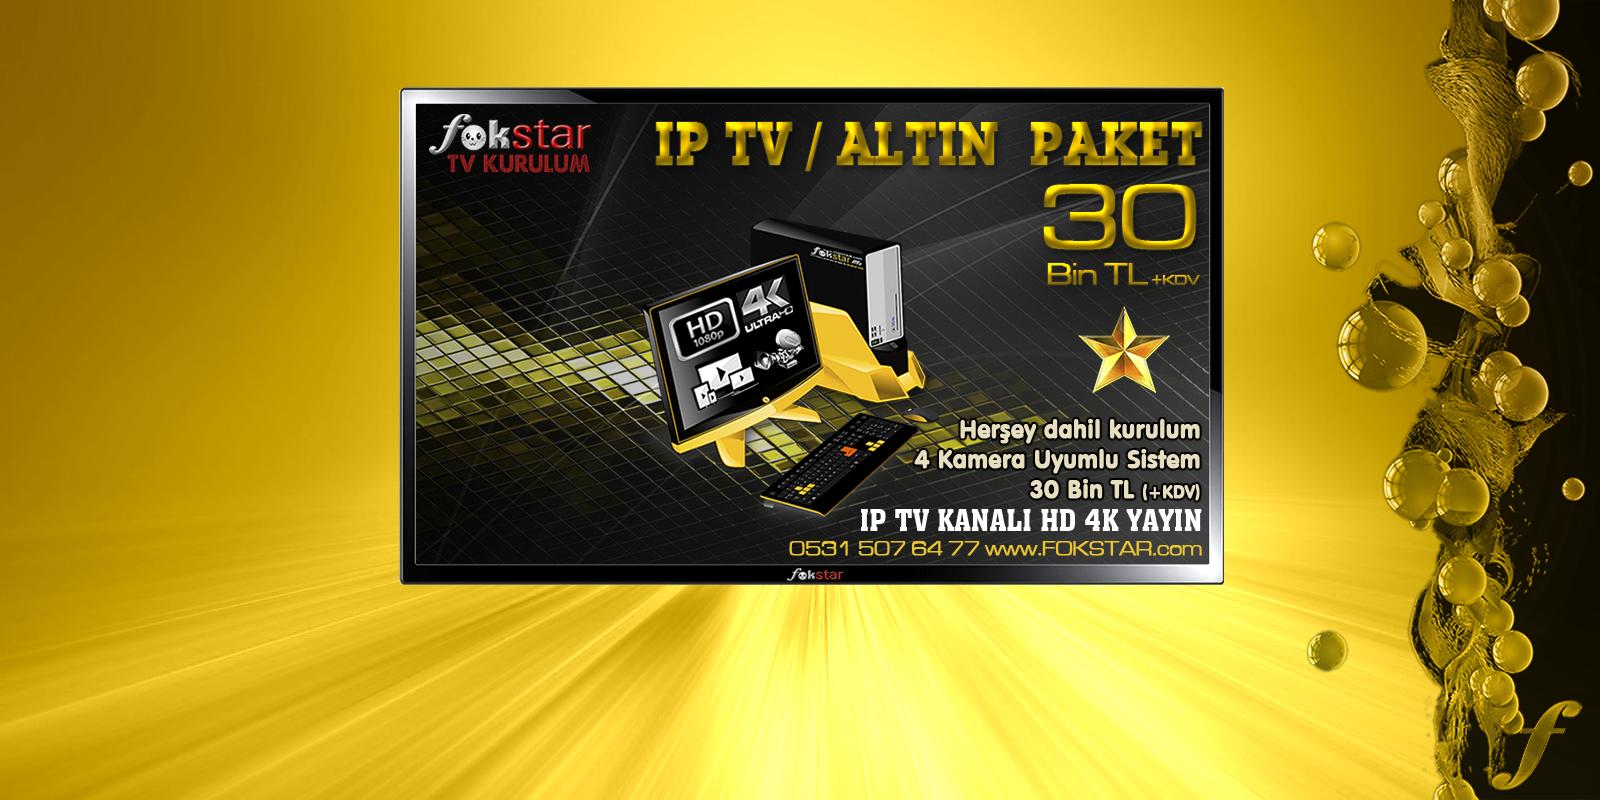 IP TV ALTIN